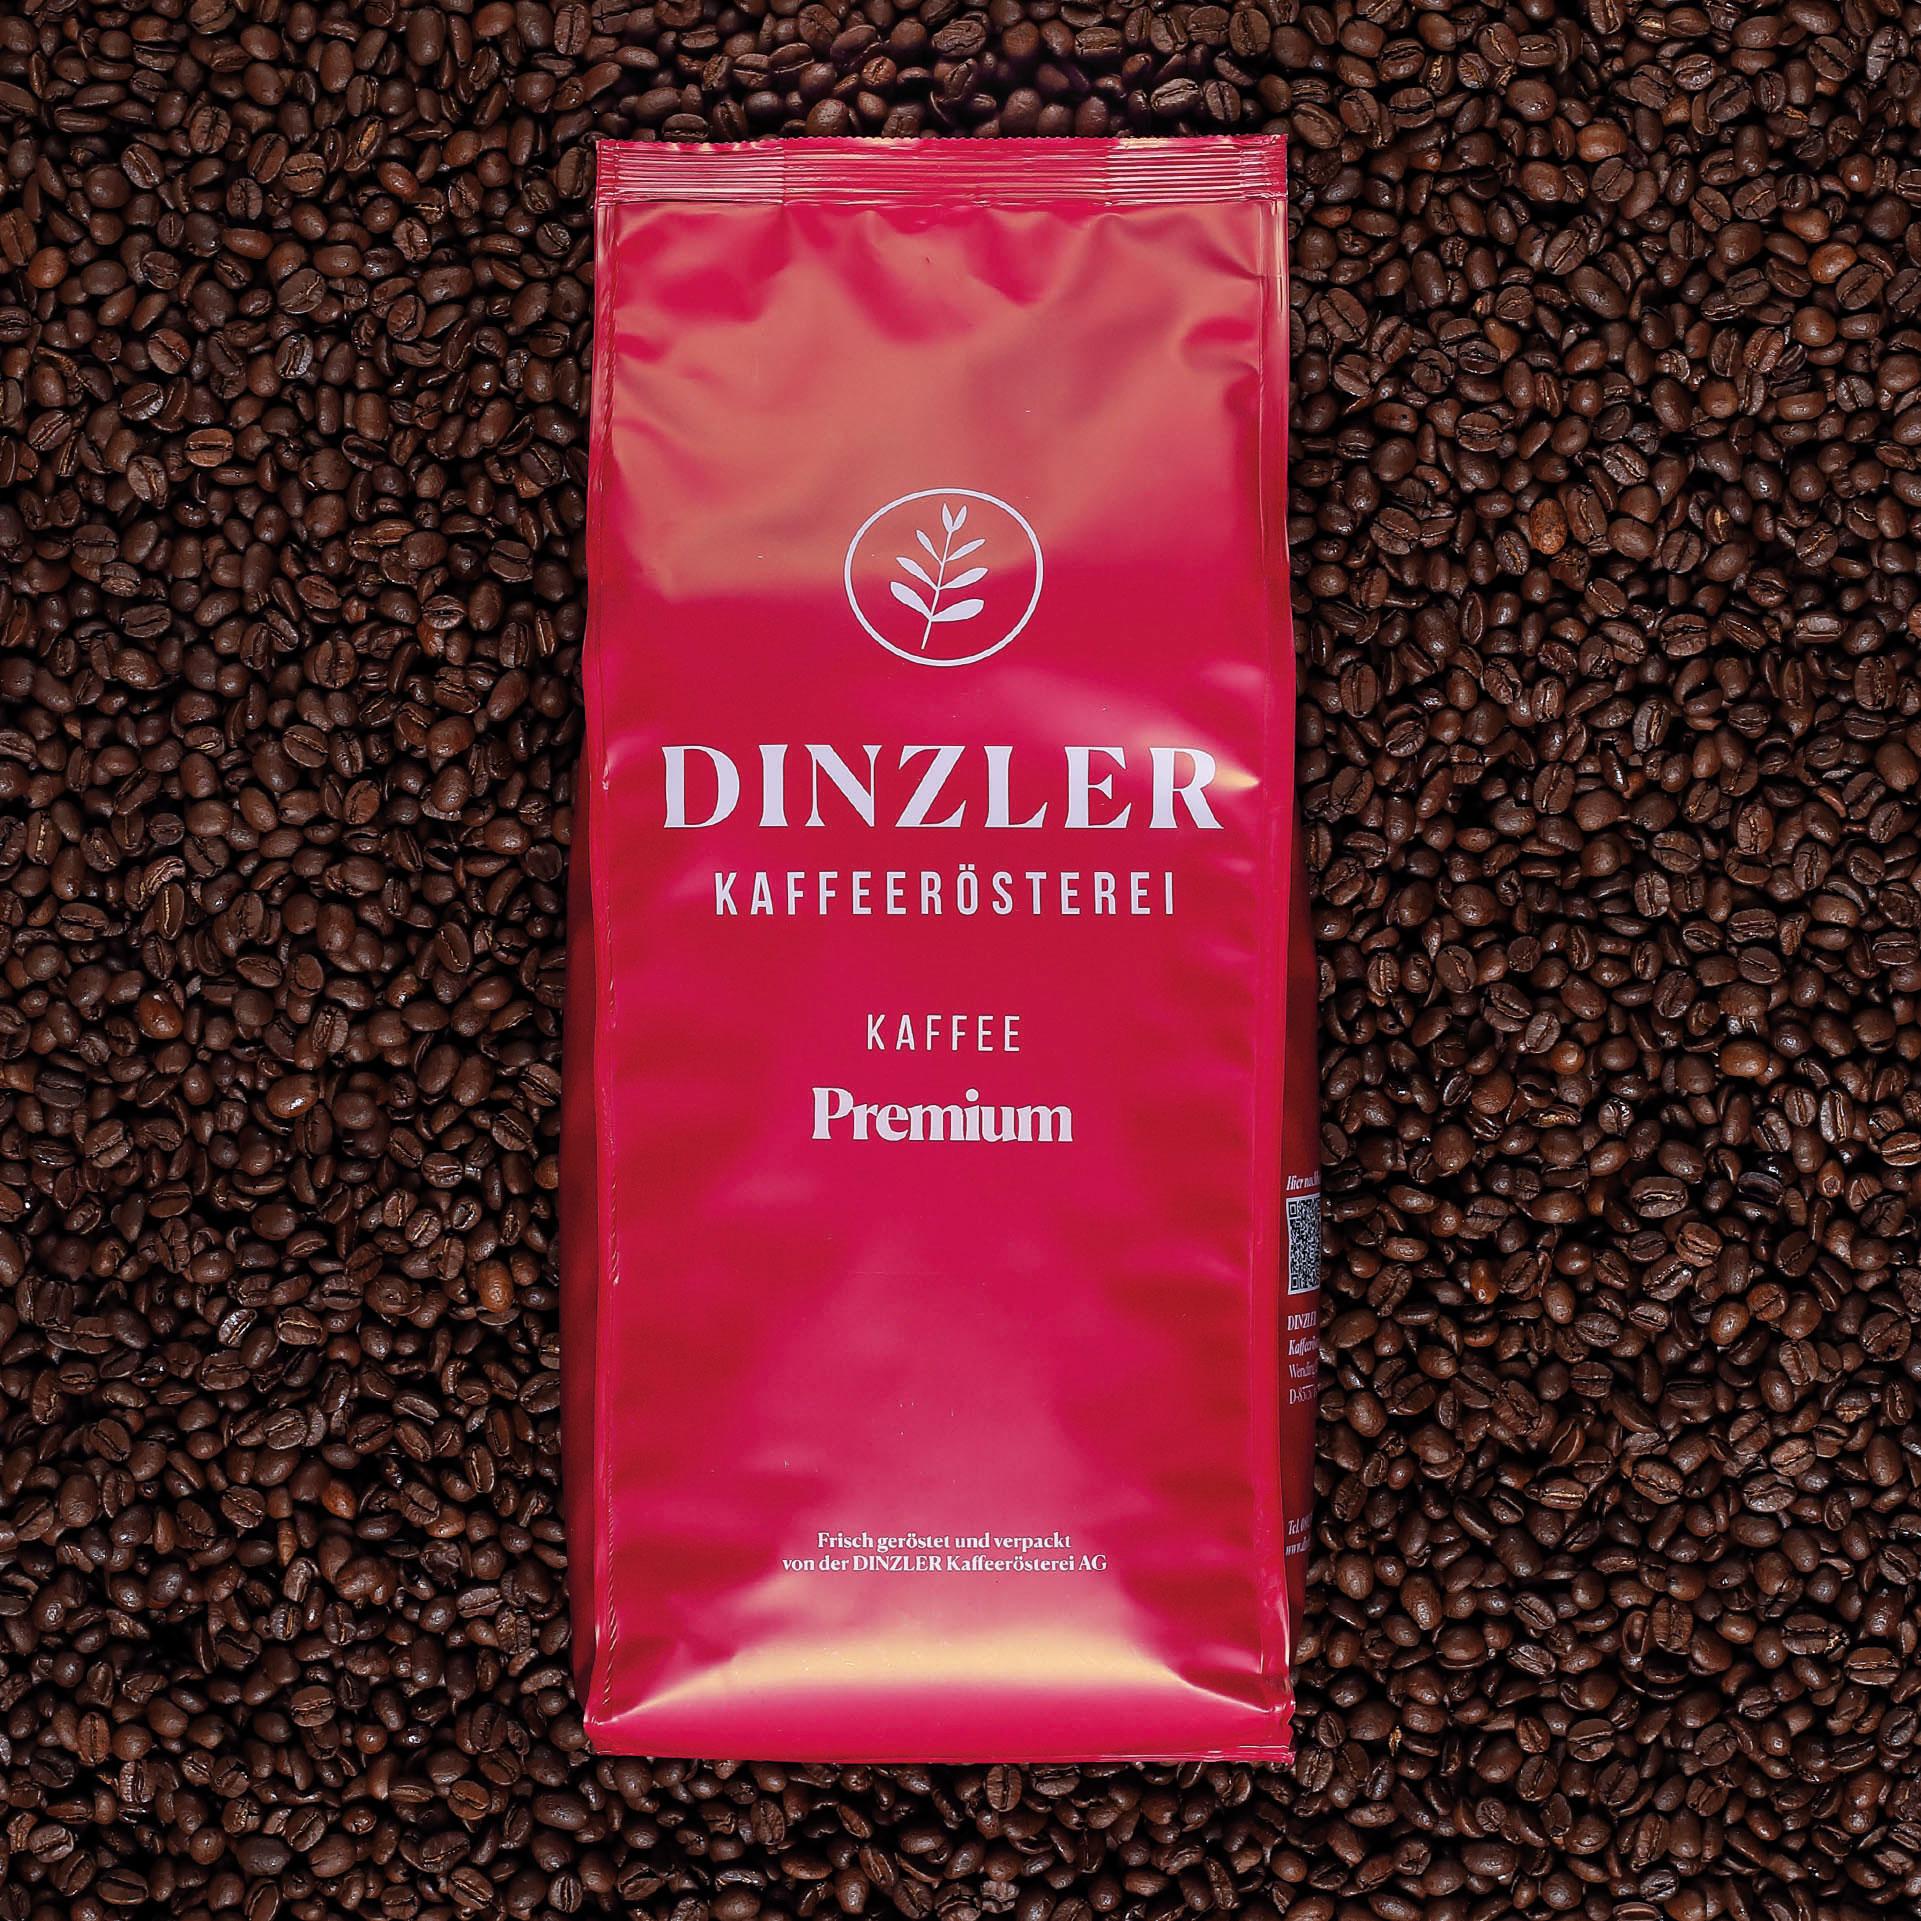 Kaffee Premium | DINZLER Shop